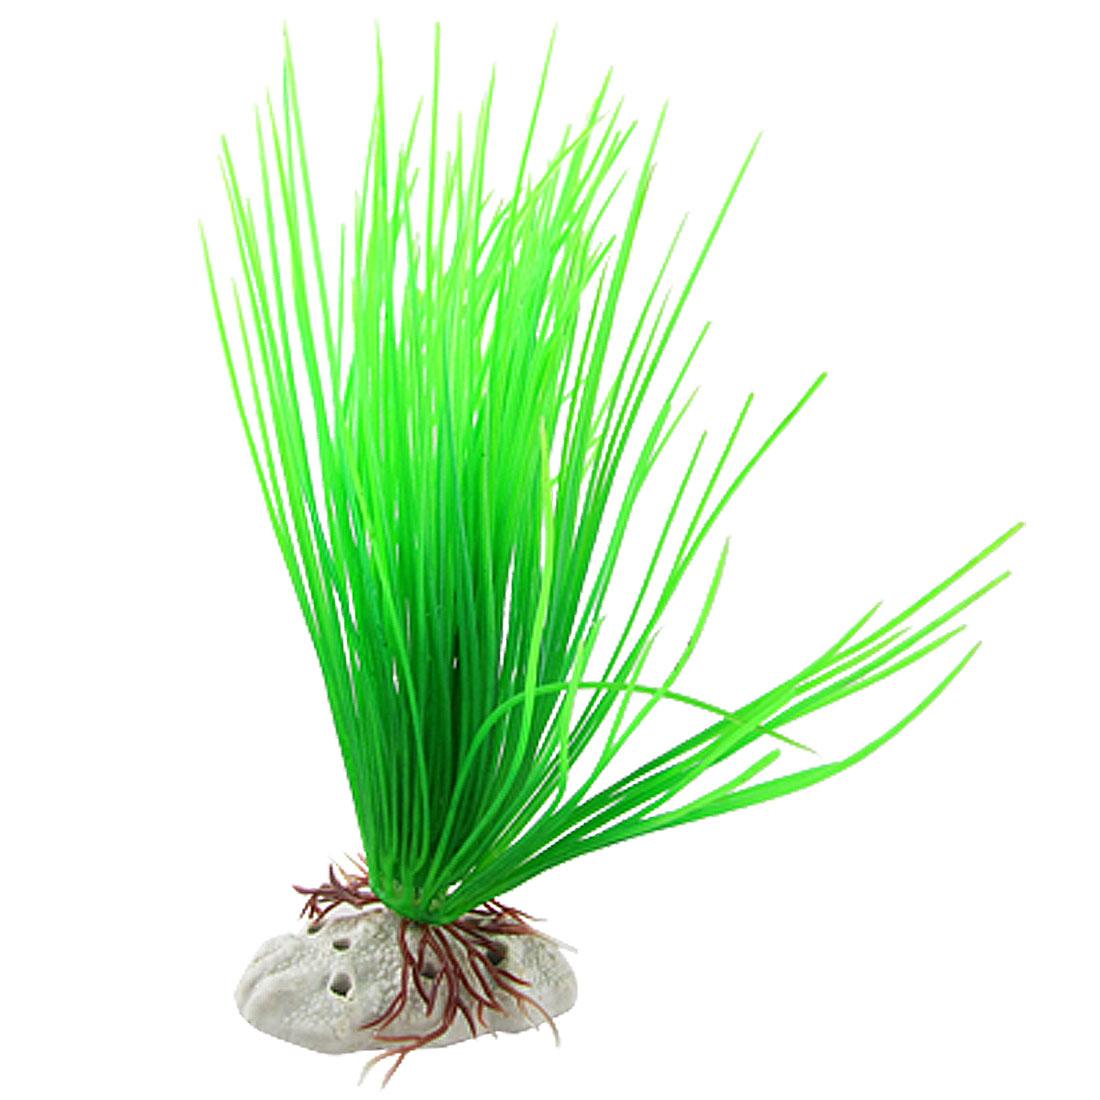 Fish Tank Plastic Green Acicular Leaf Aquatic Plants Decor w Ceramic Base